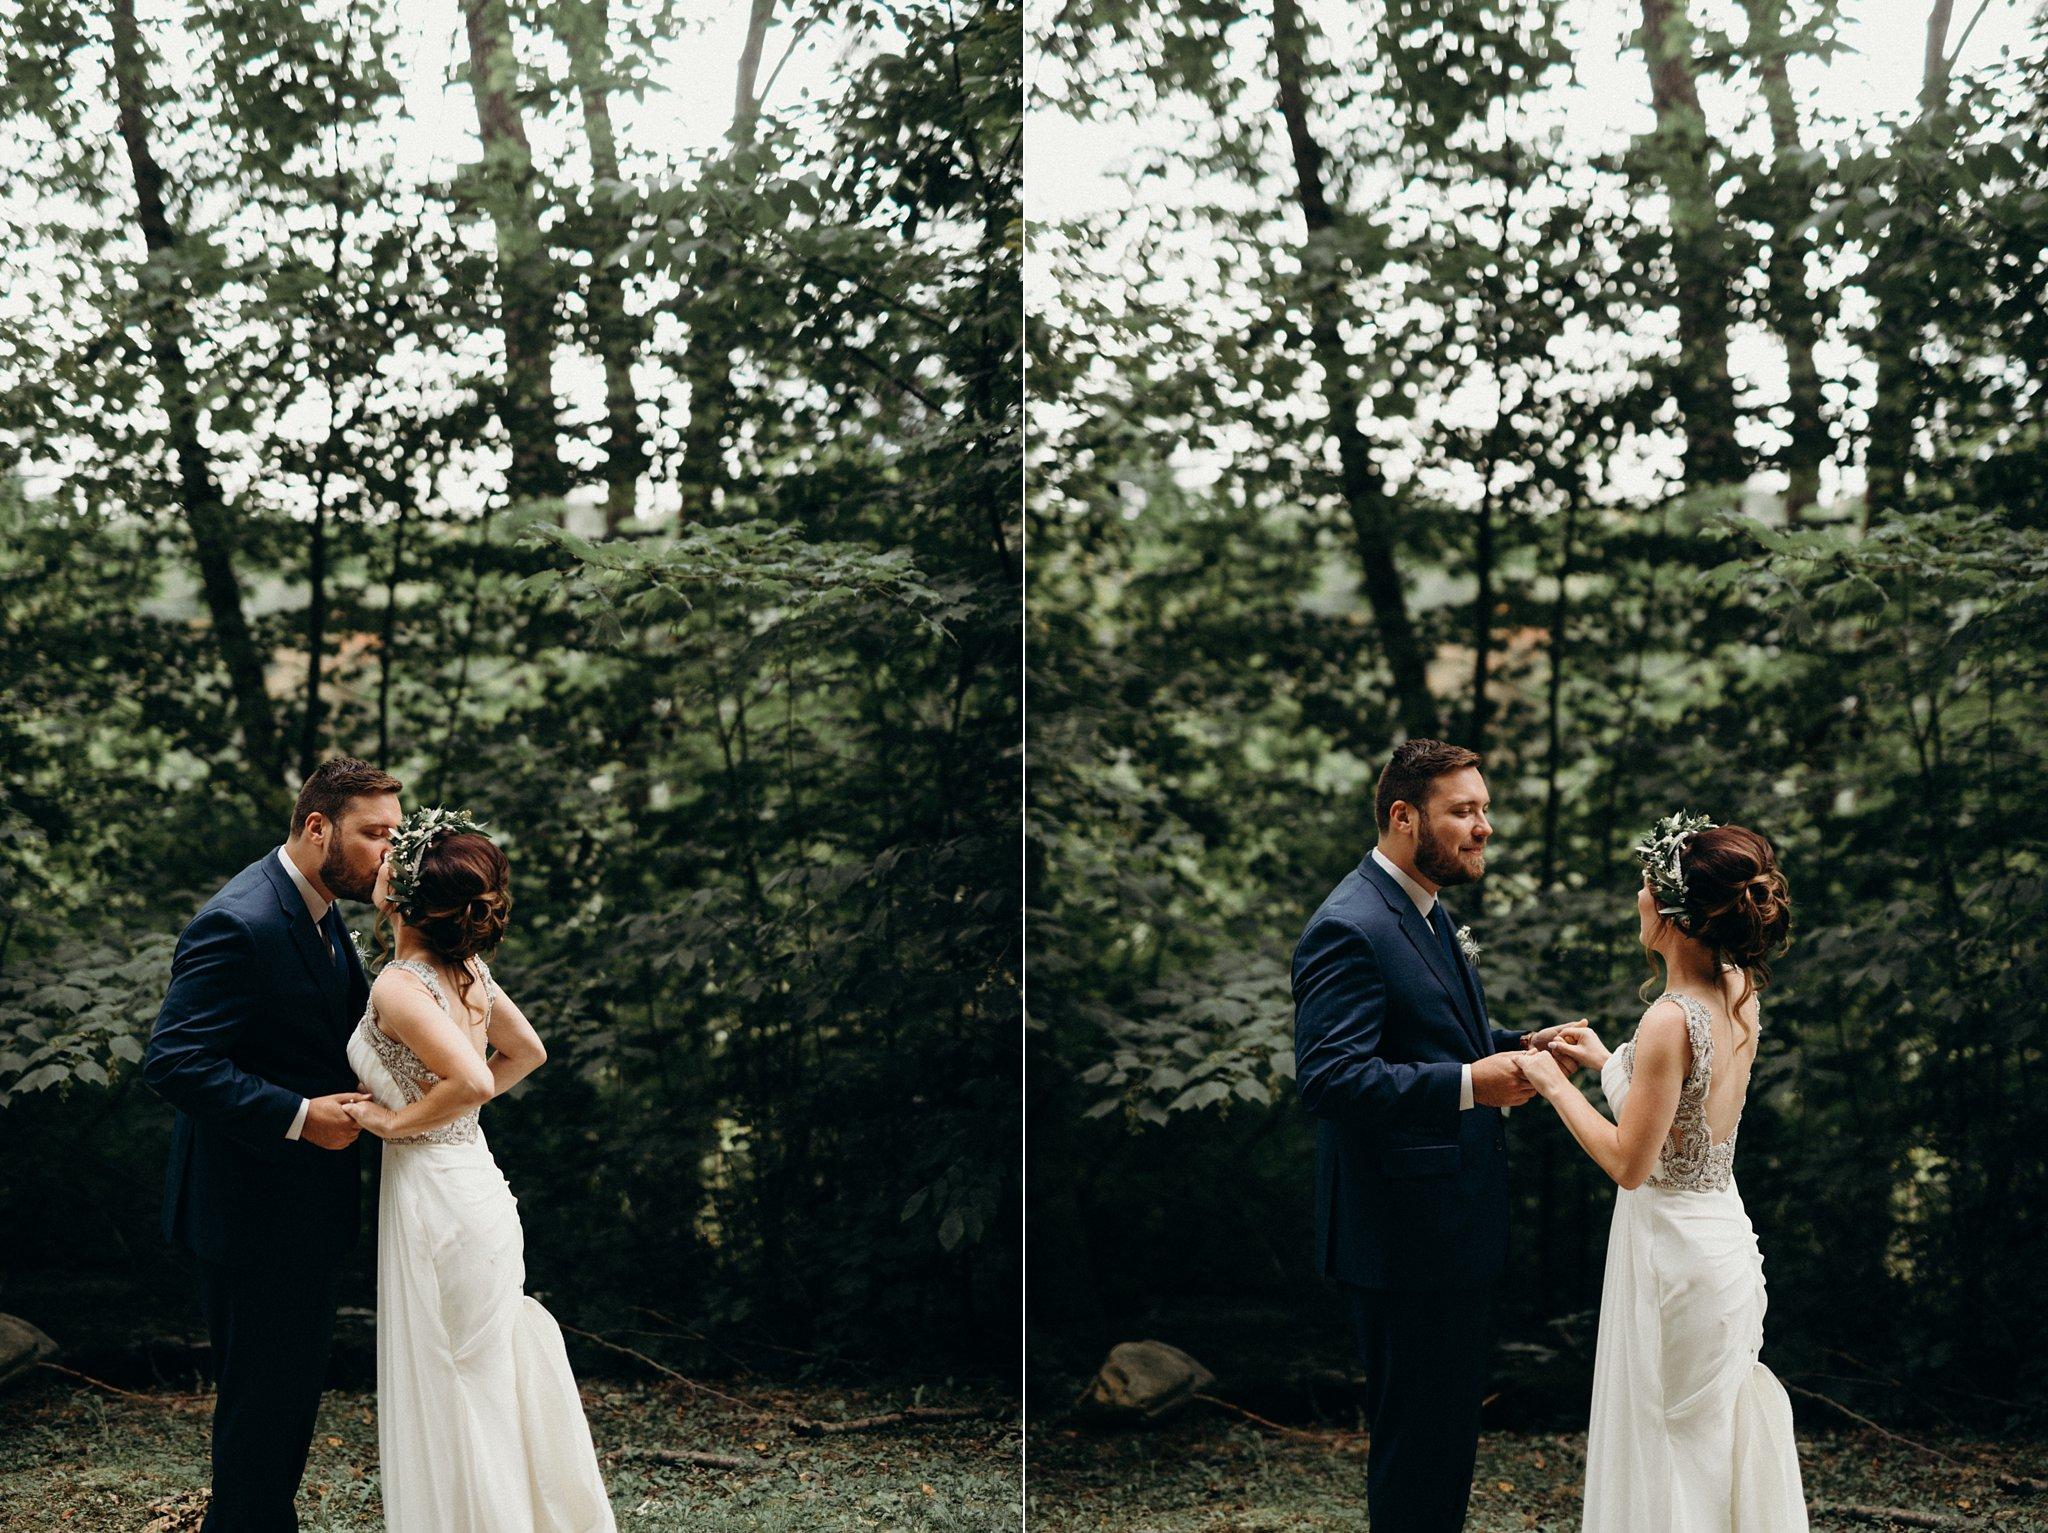 kaihla_tonai_intimate_wedding_elopement_photographer_6572.jpg